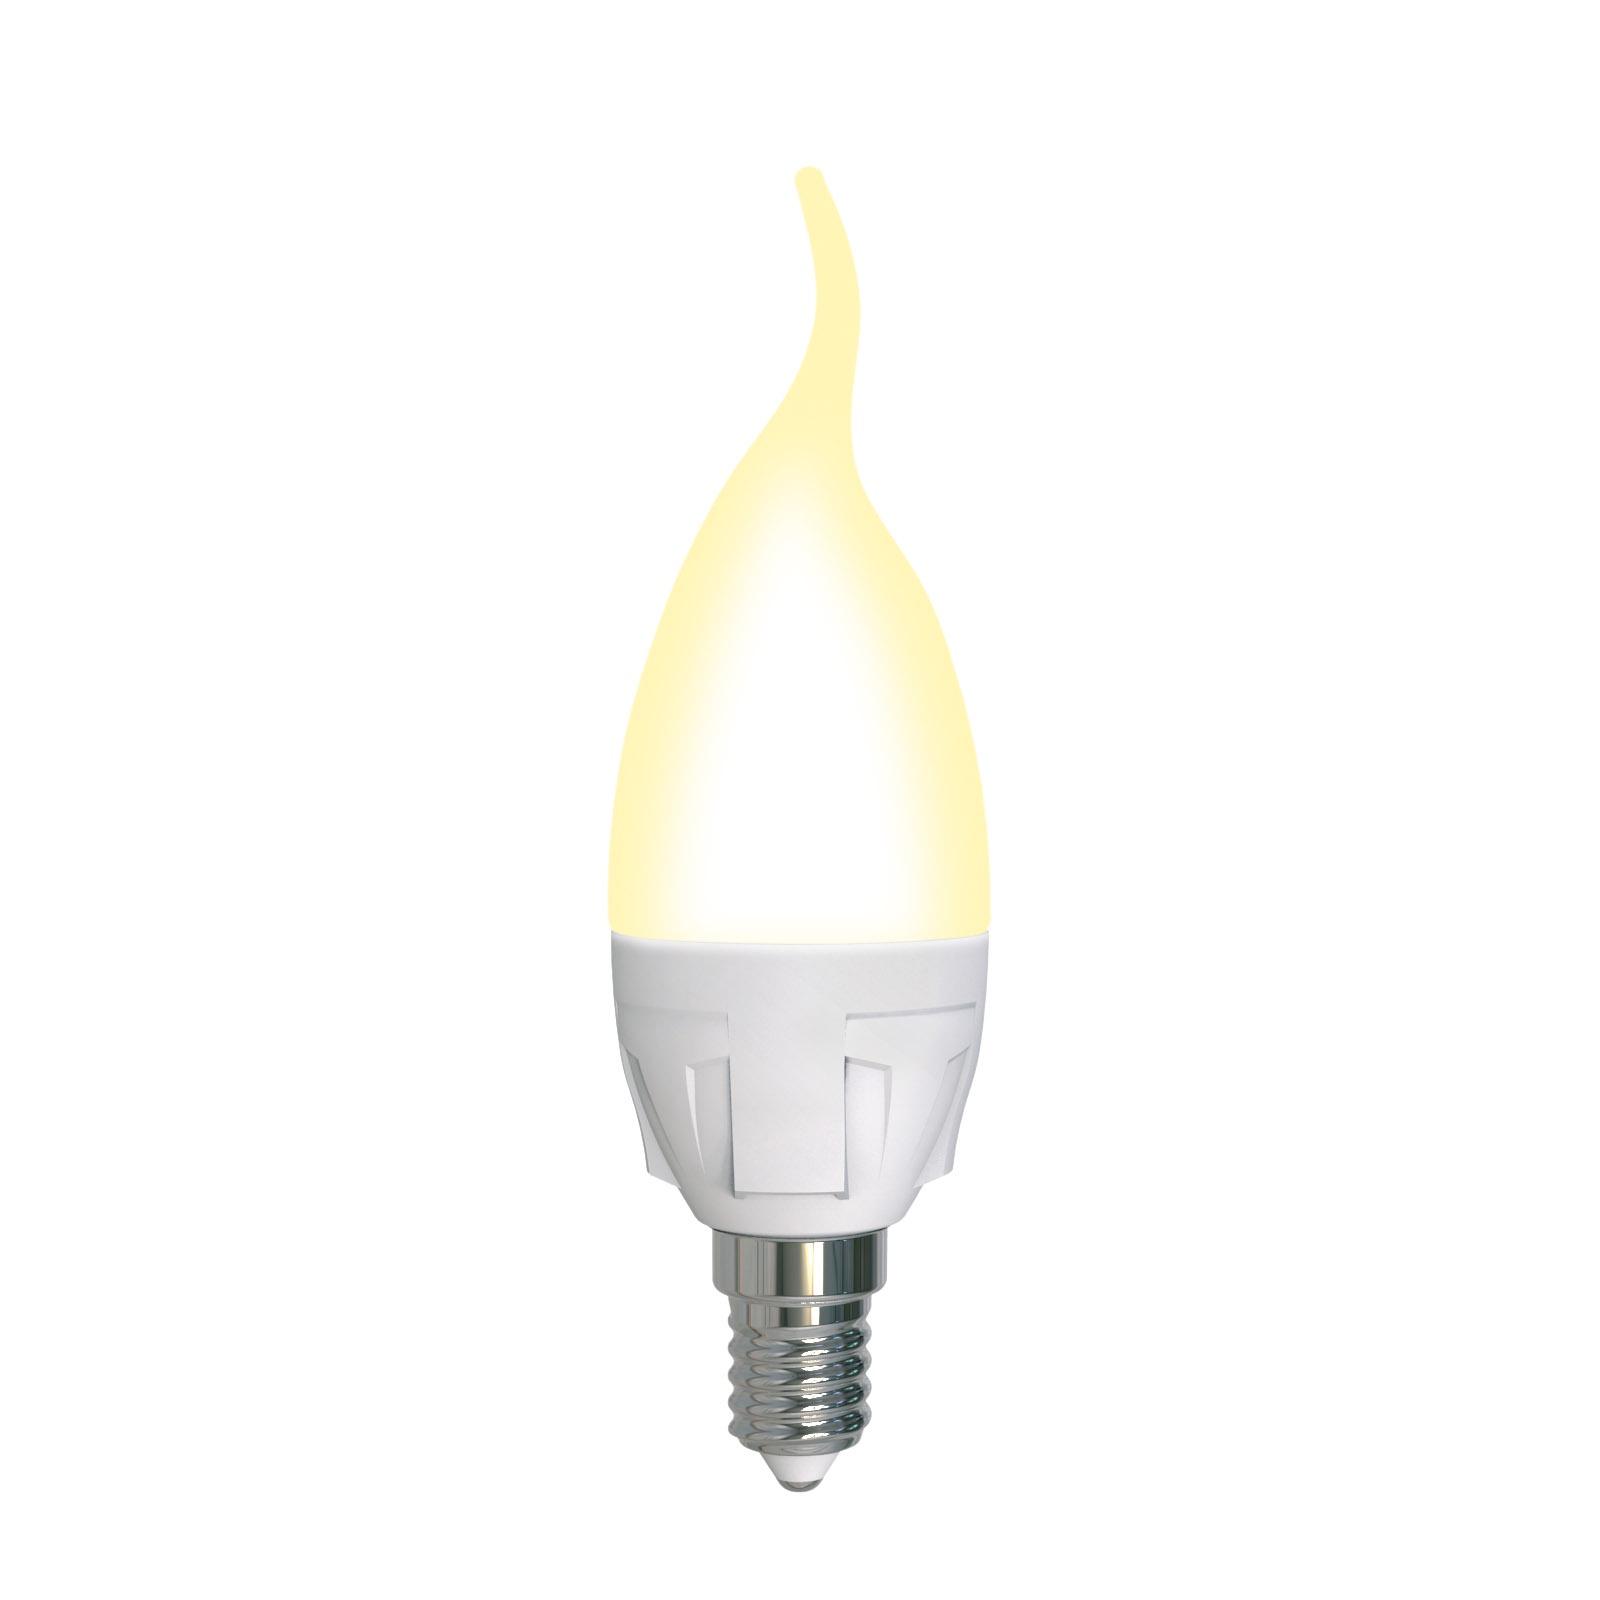 Лампочка Uniel LED-CW37 7W/3000K/E14/FR/DIM, Теплый свет 7 Вт, Светодиодная